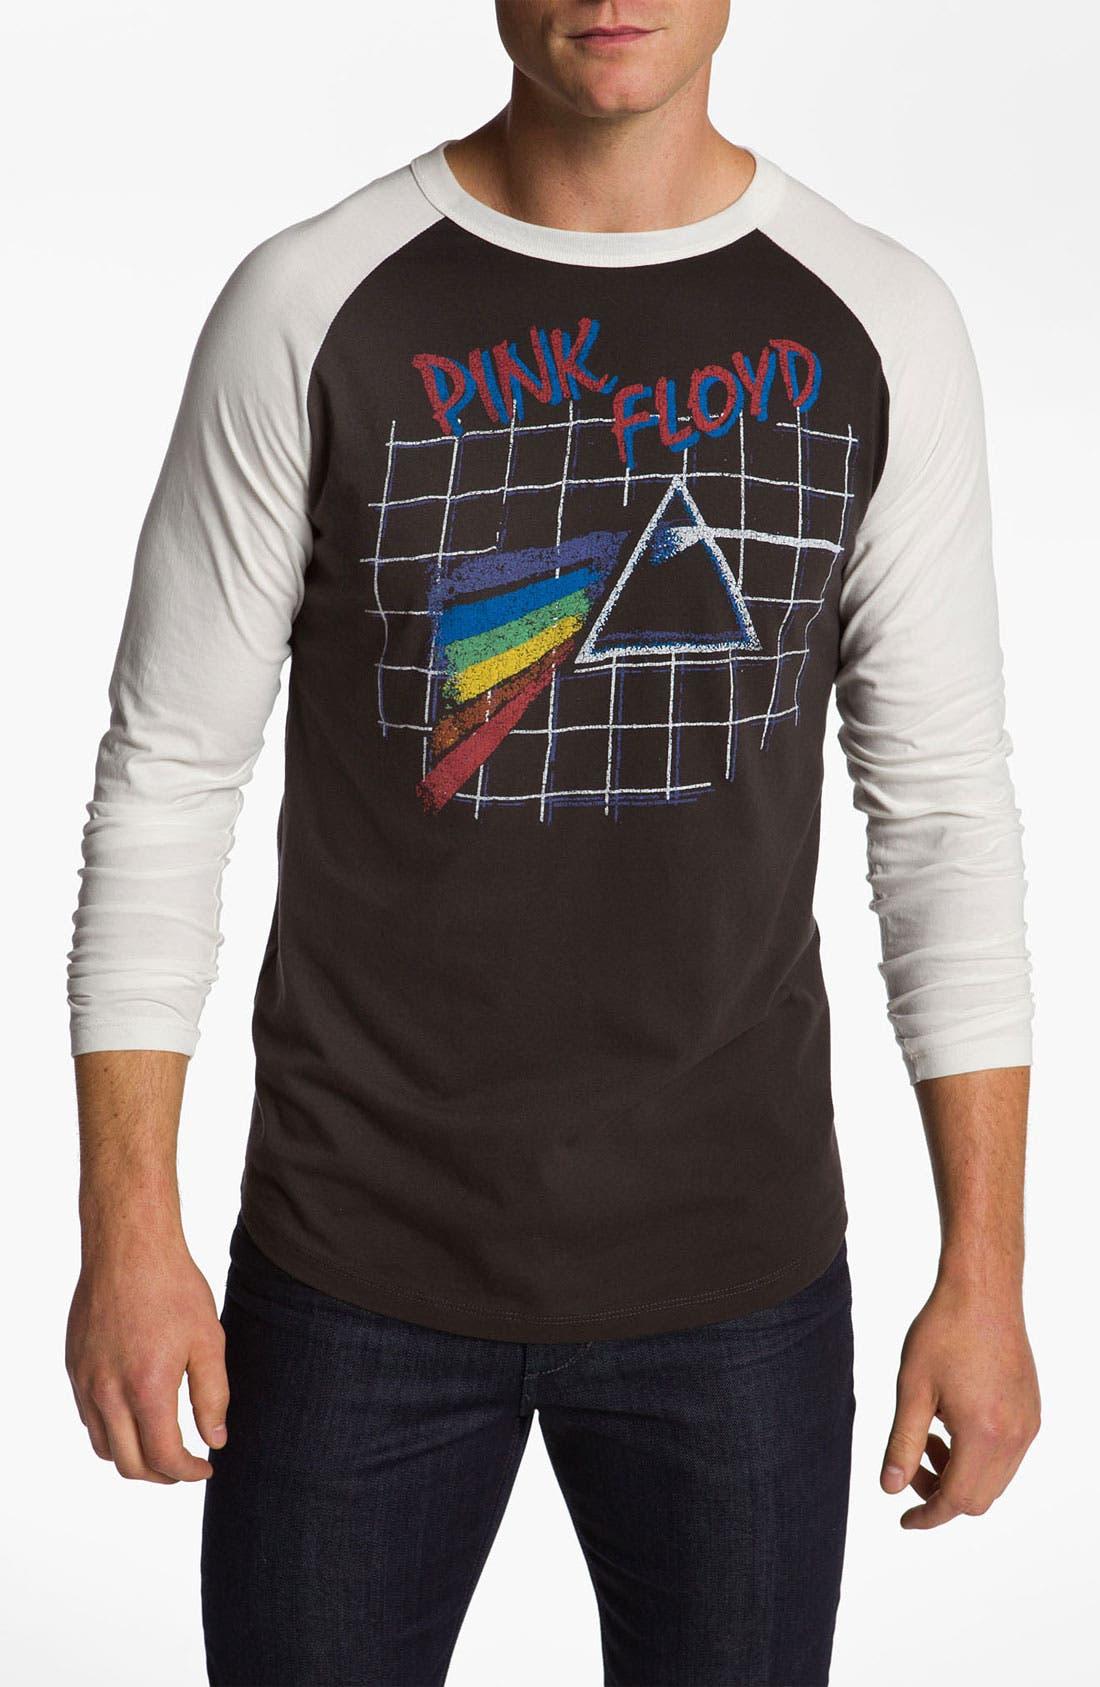 Alternate Image 1 Selected - Junk Food 'Pink Floyd' Long Sleeve T-Shirt